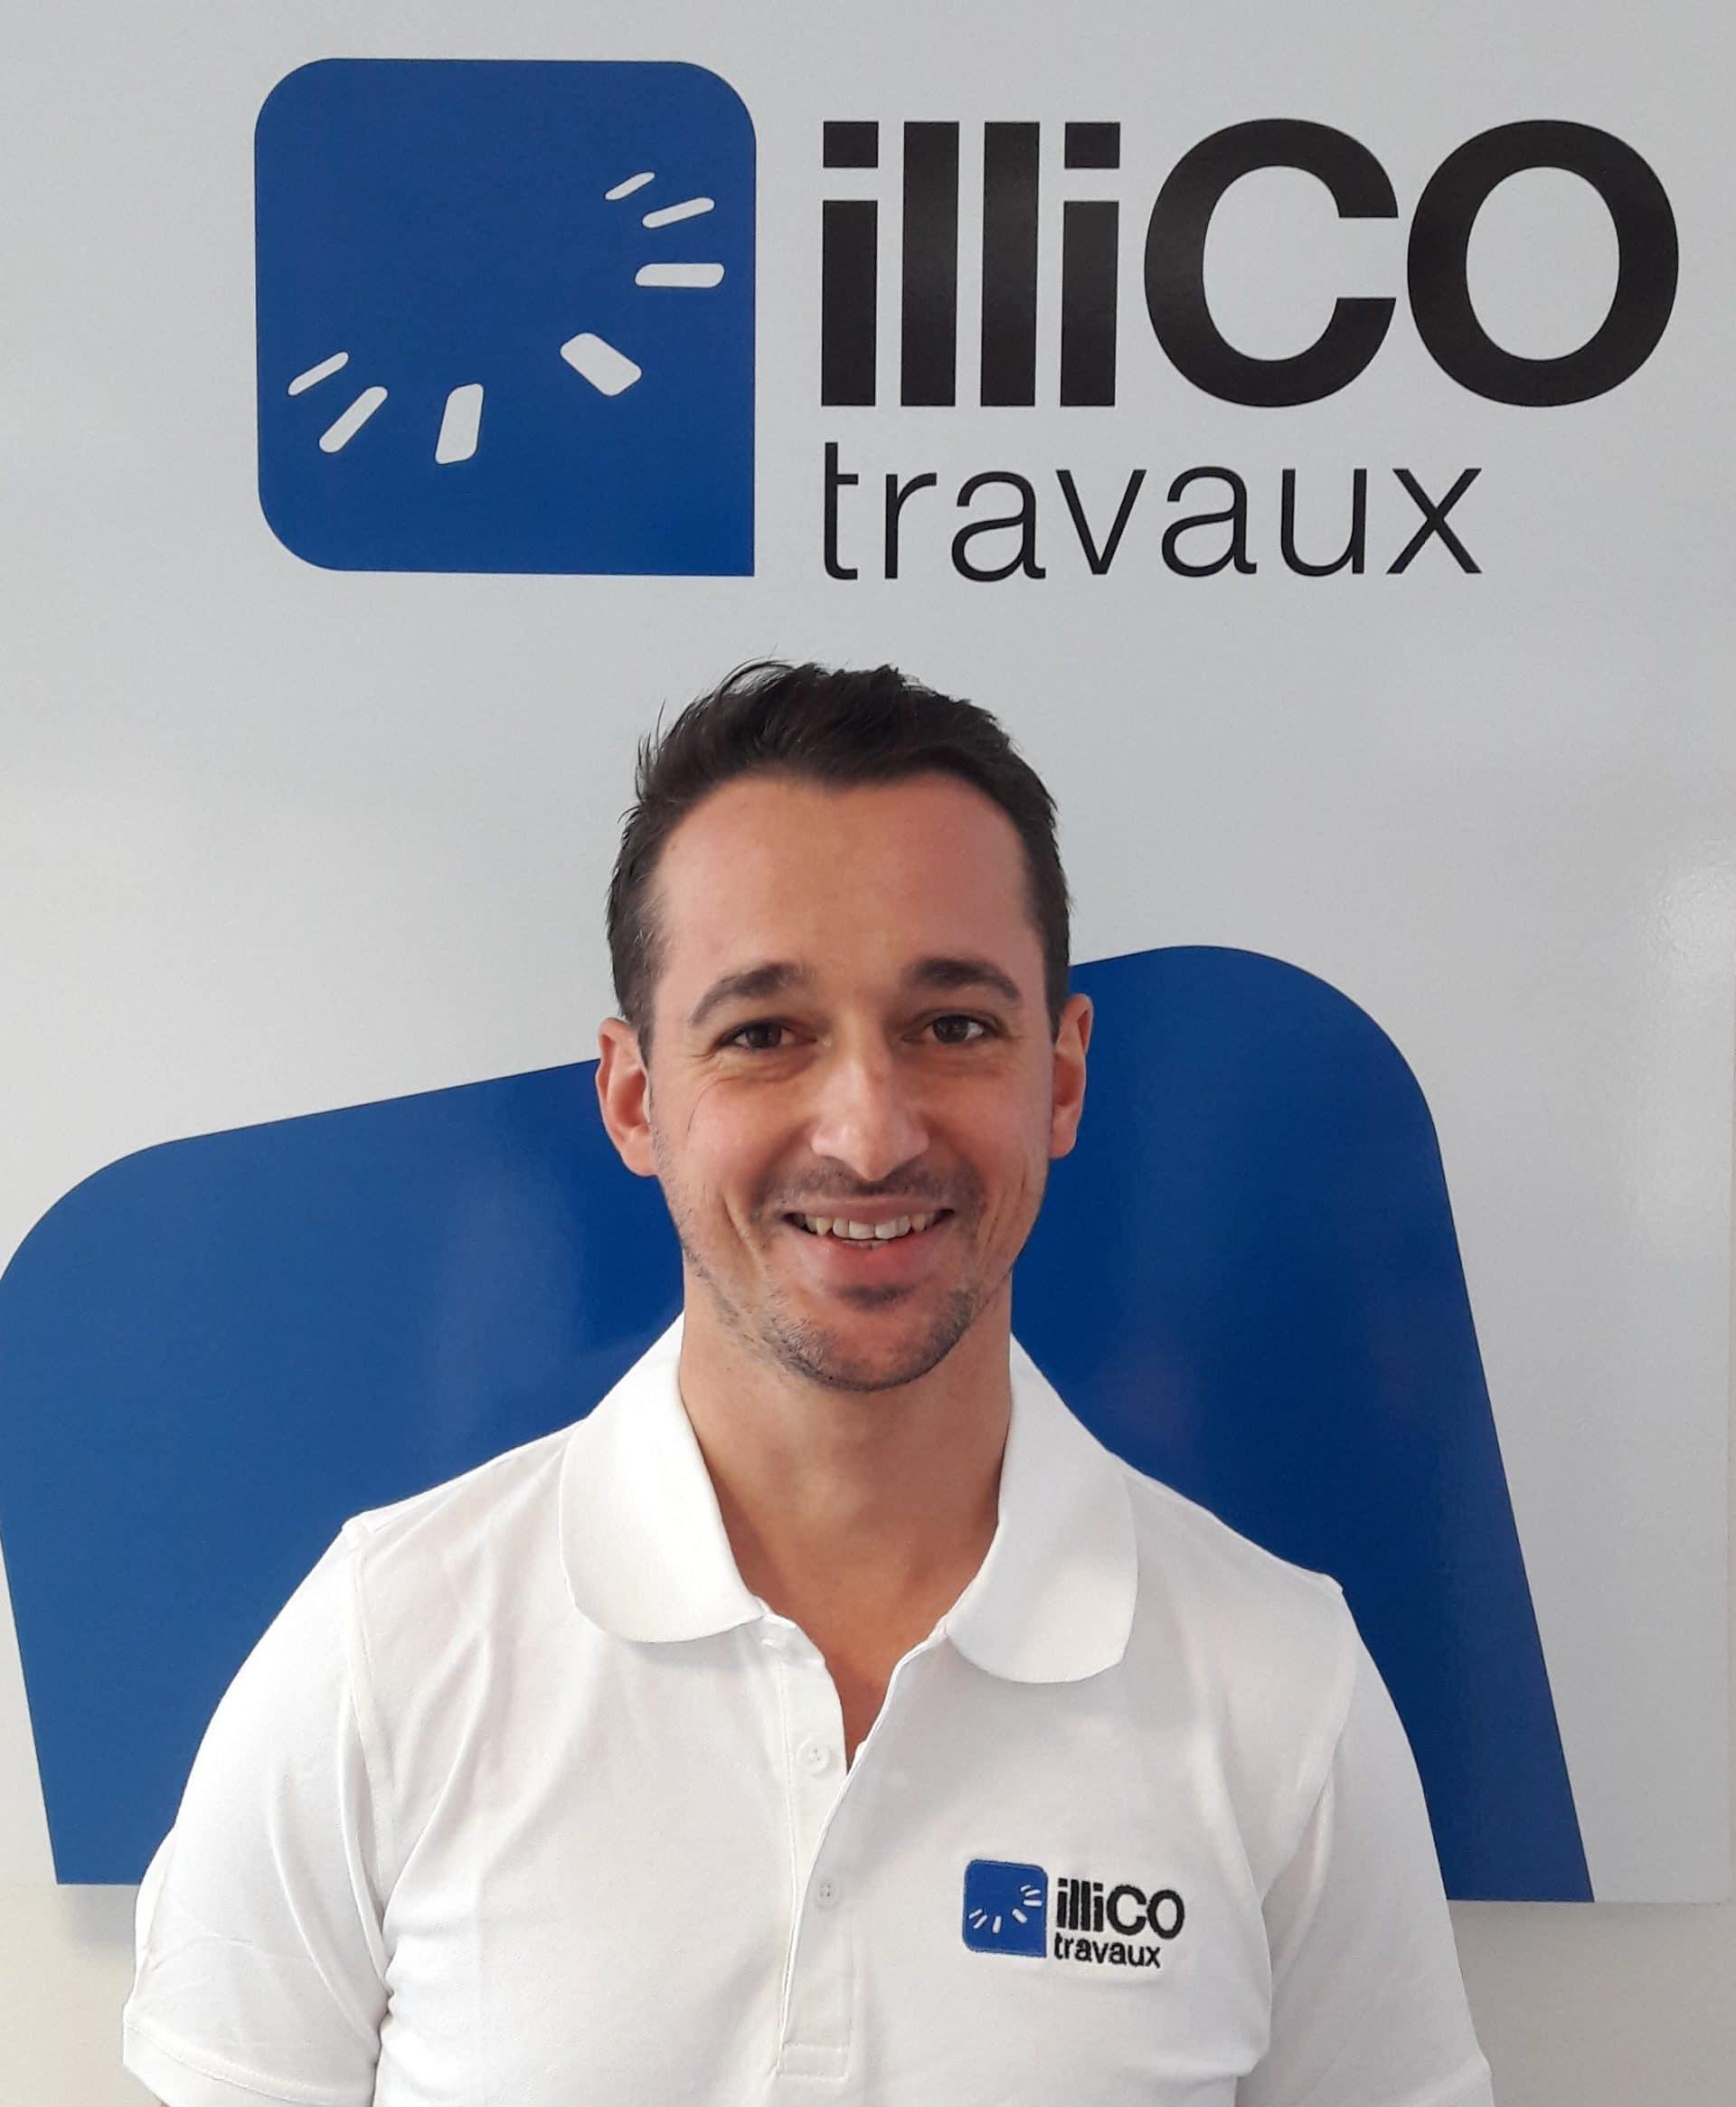 illiCO travaux Angoulême